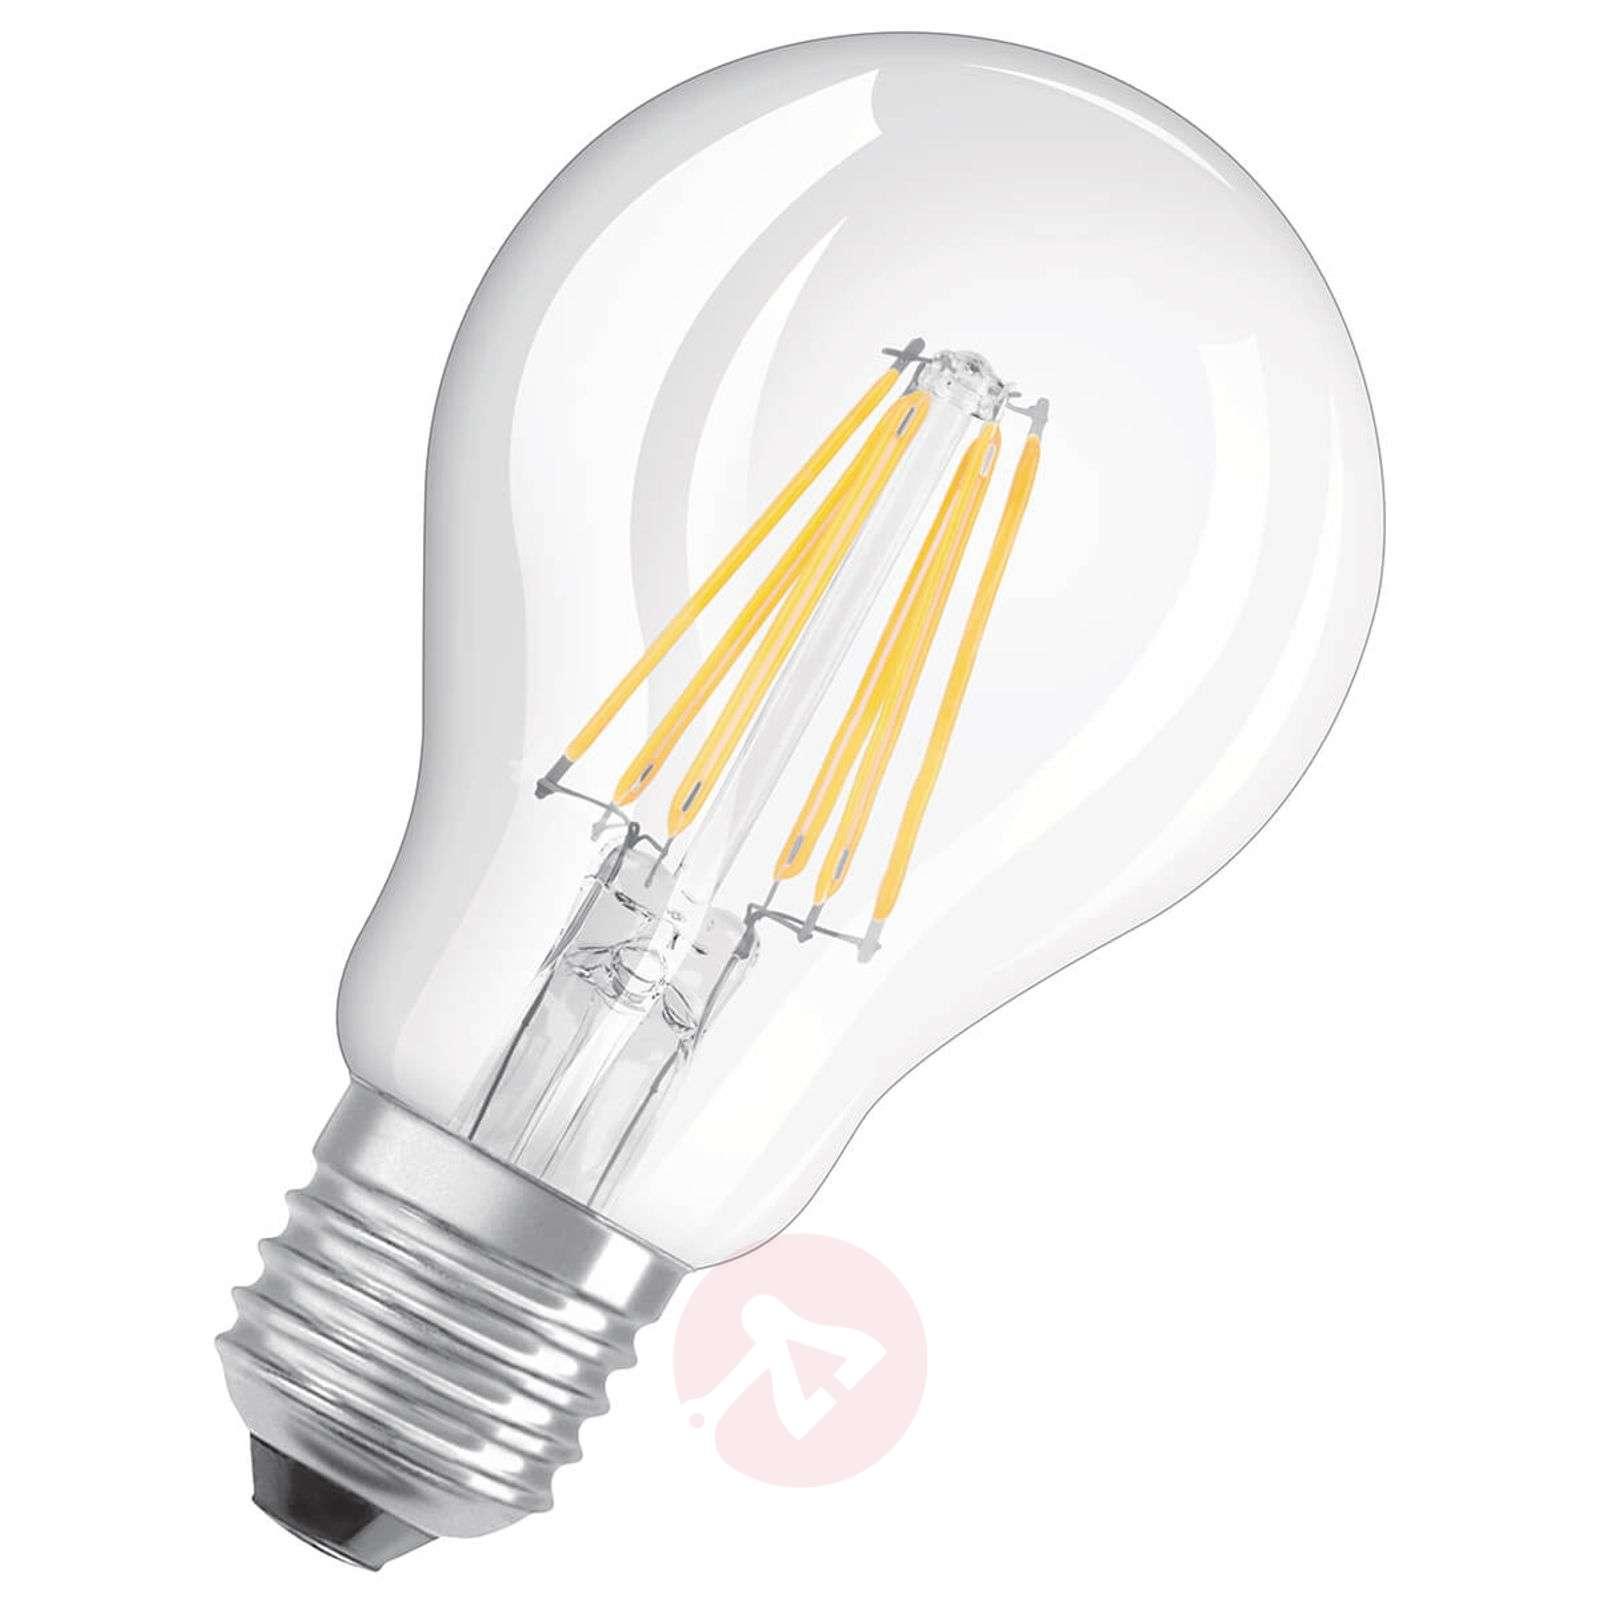 LED filament bulb E27 6 W, warm white, set of 3-7262097-01